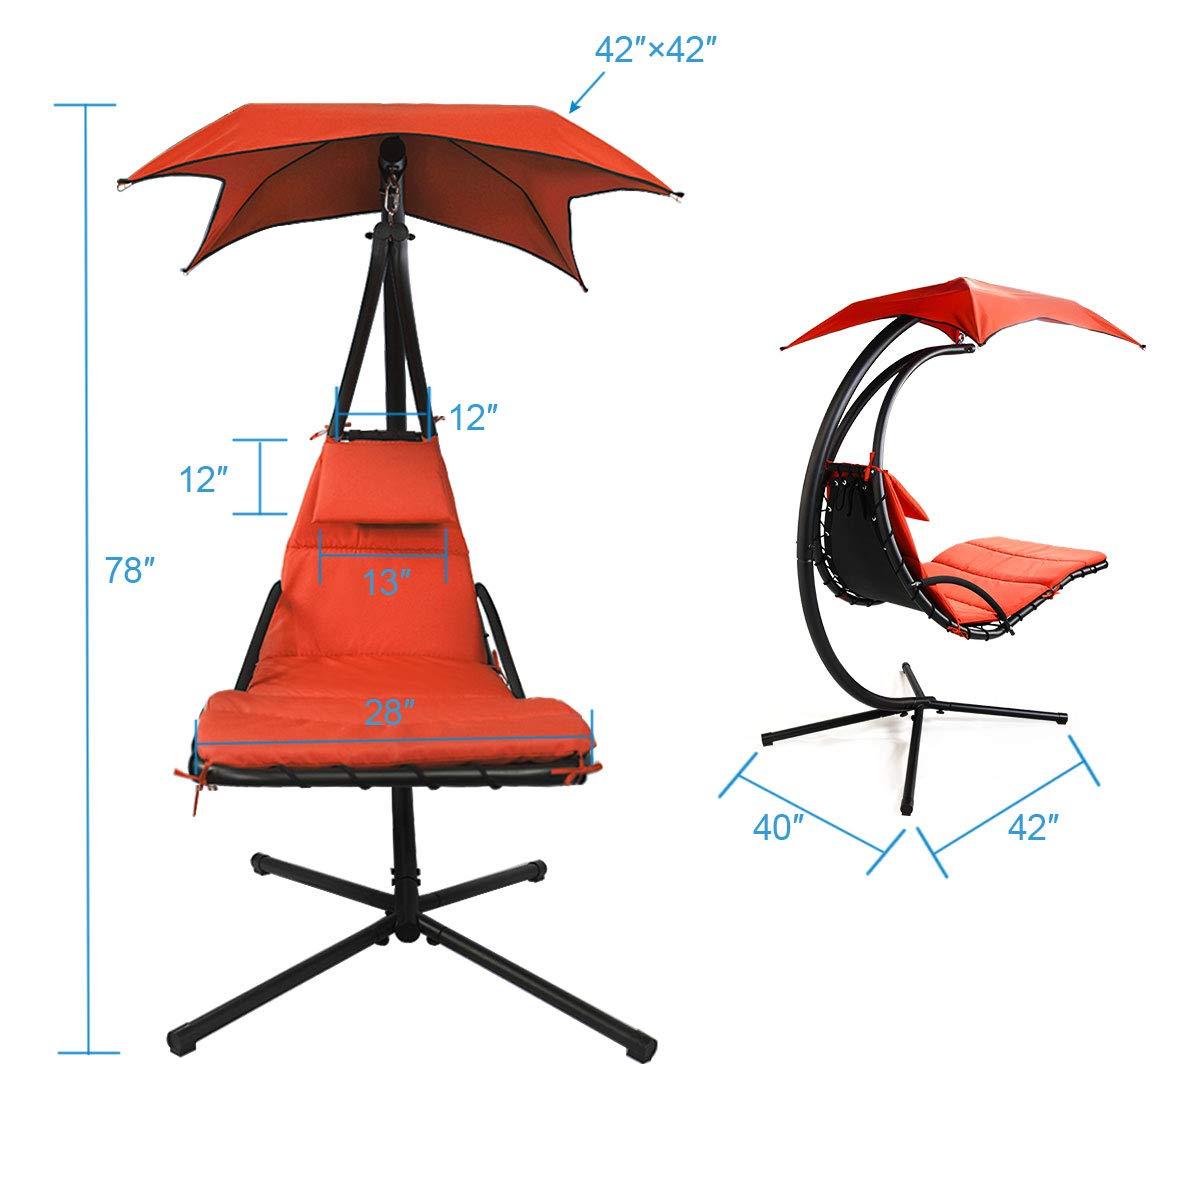 Sandinrayli Hanging Lounger Chaise Porch Swing Hammock Chair Arc Stand Cushion Sun Canopy Orange